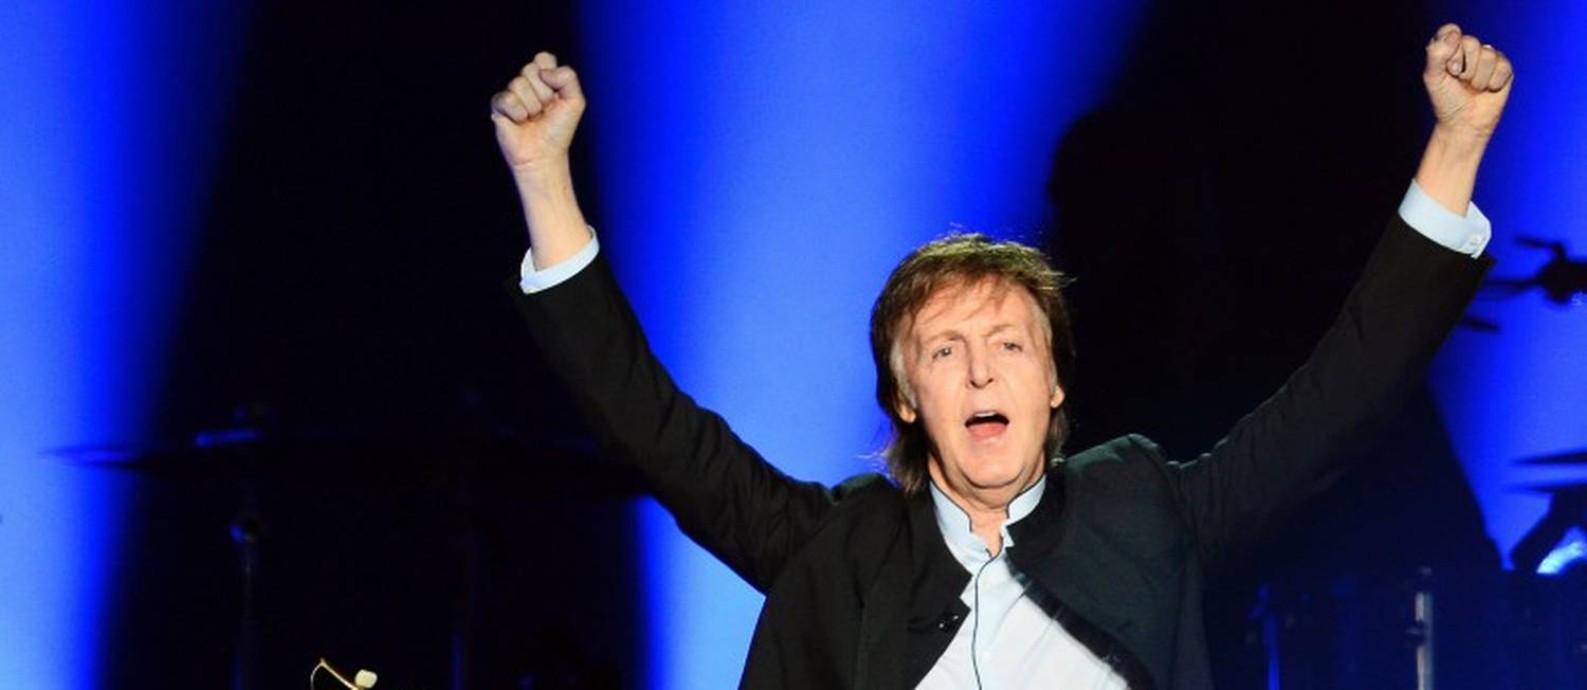 O cantor e ex-Beatle Paul McCartney Foto: BERTRAND GUAY / AFP